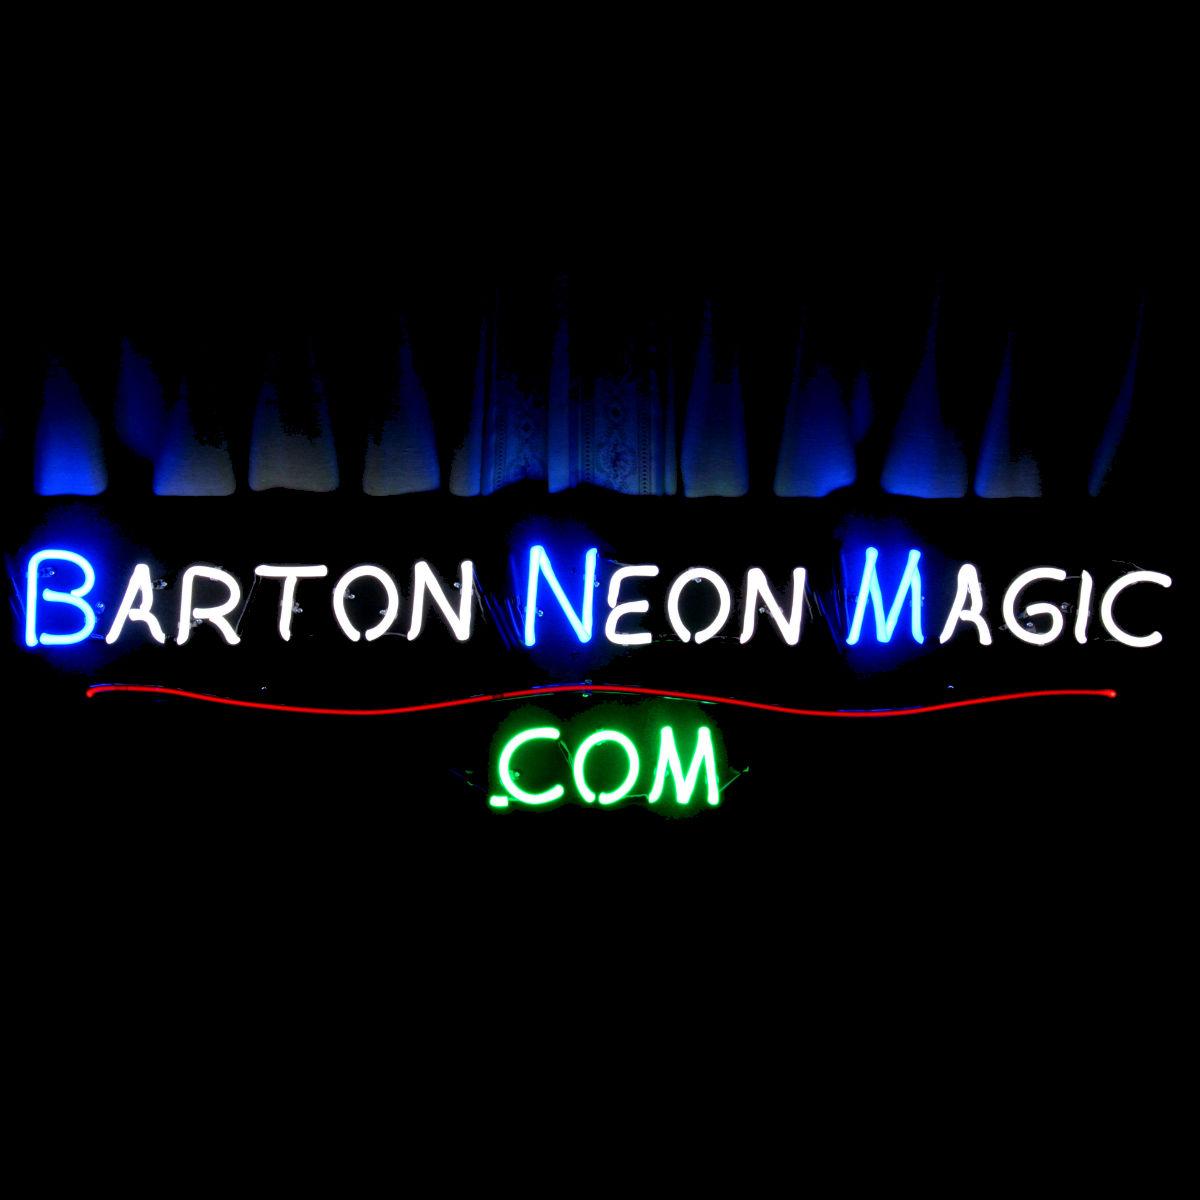 STUNNING DESIGNER NEON LIGHT SCULPTURES by John Barton - BartonNeonMagic.com